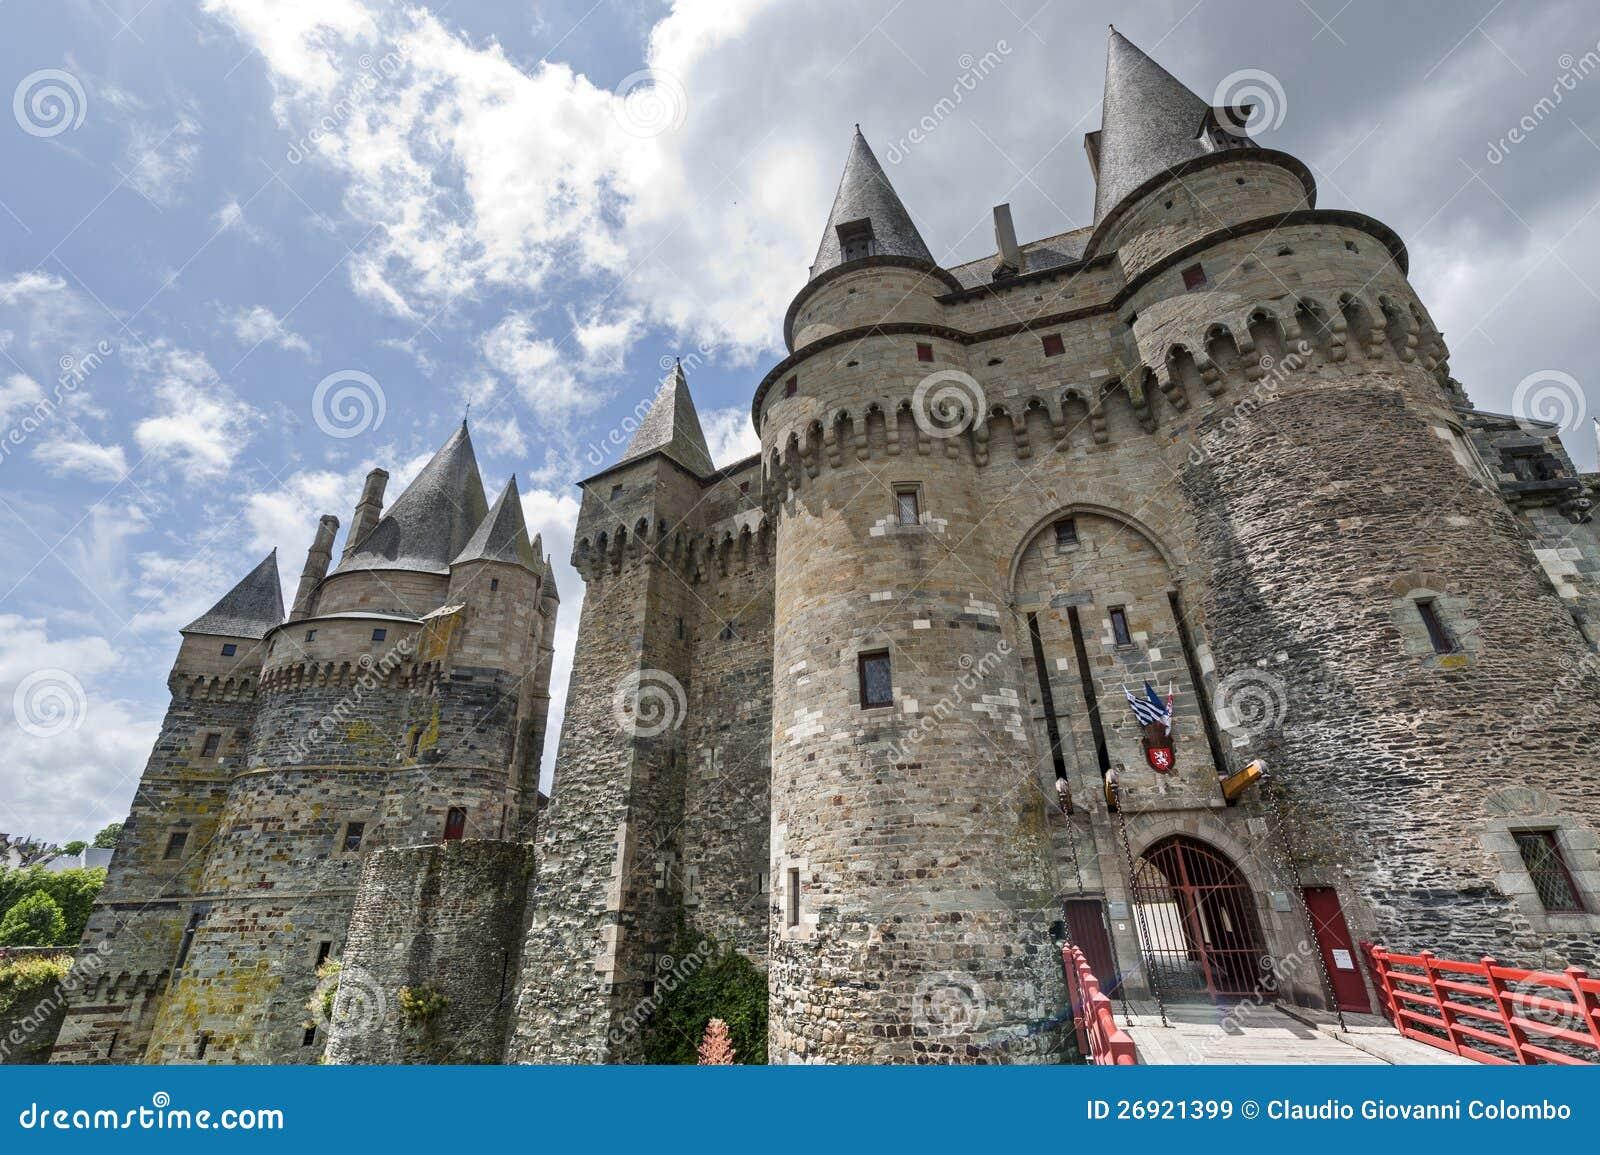 Vitre, Brittany, château